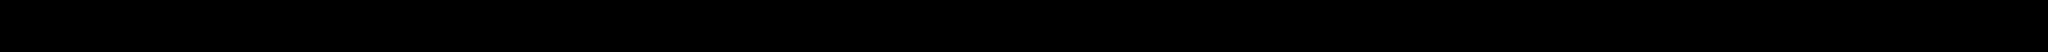 SACHS 54630-2R310 Pruzina podvozku